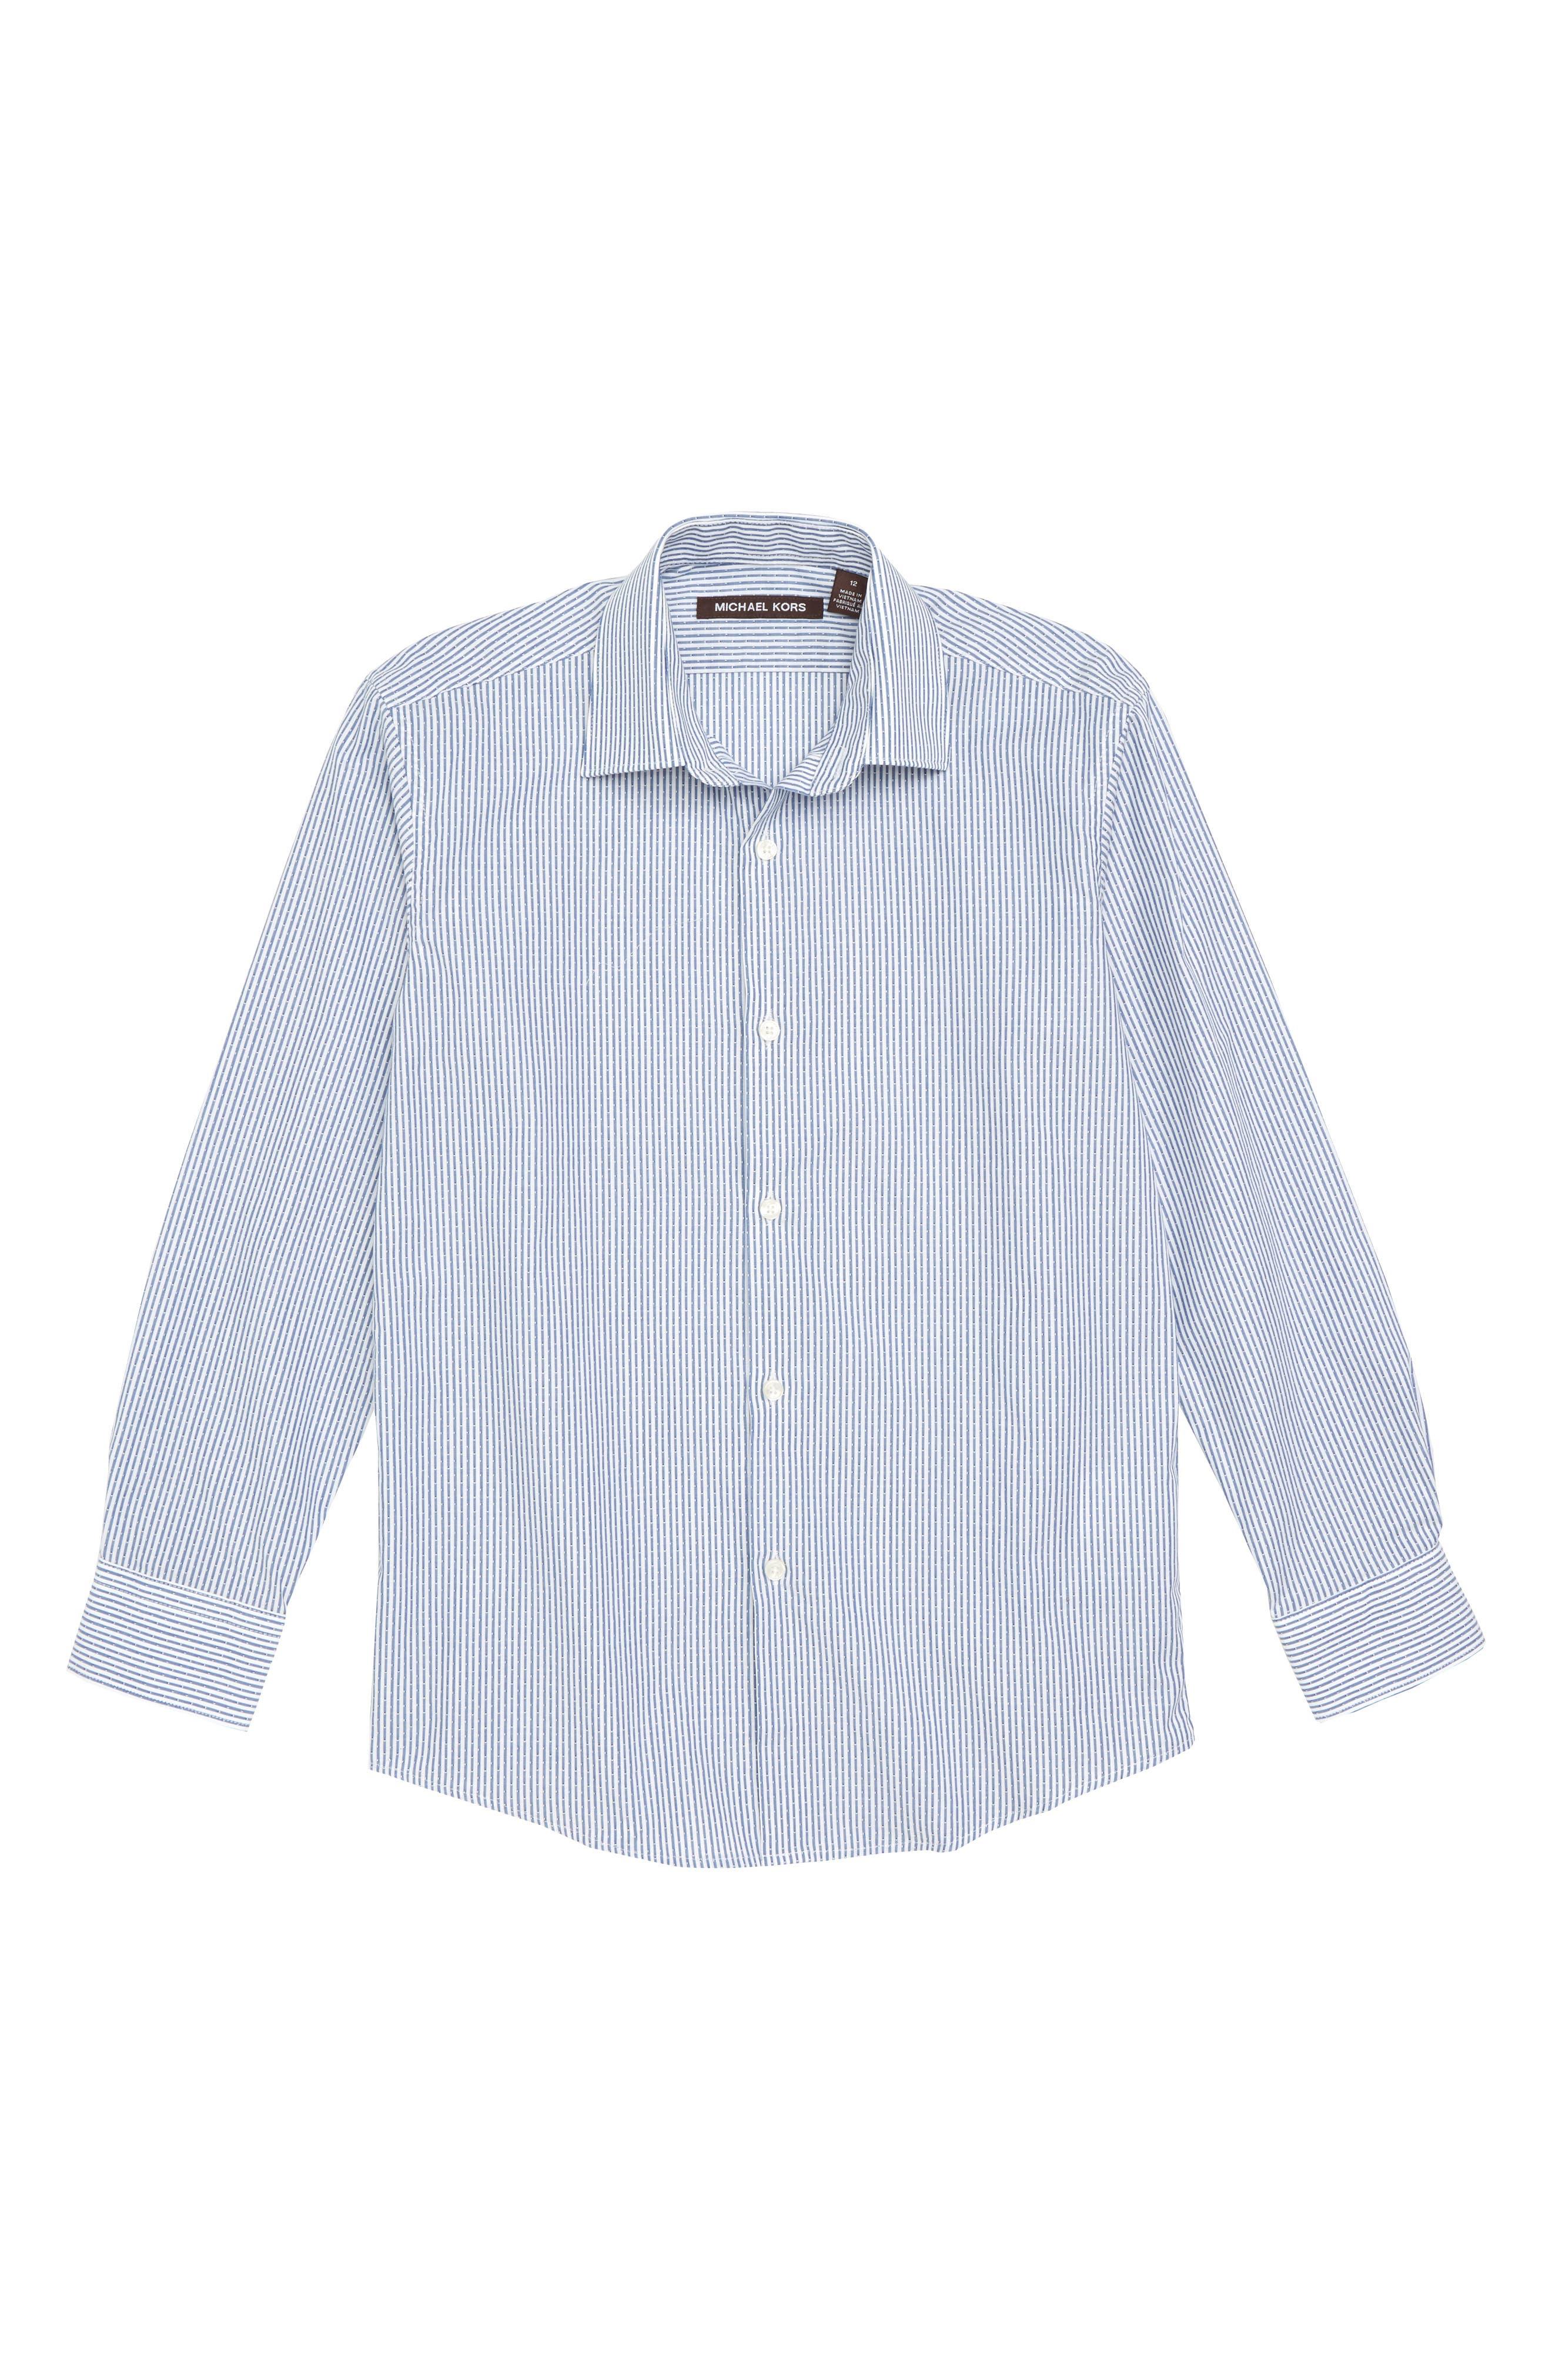 Stripe Dress Shirt,                         Main,                         color, DARK BLUE